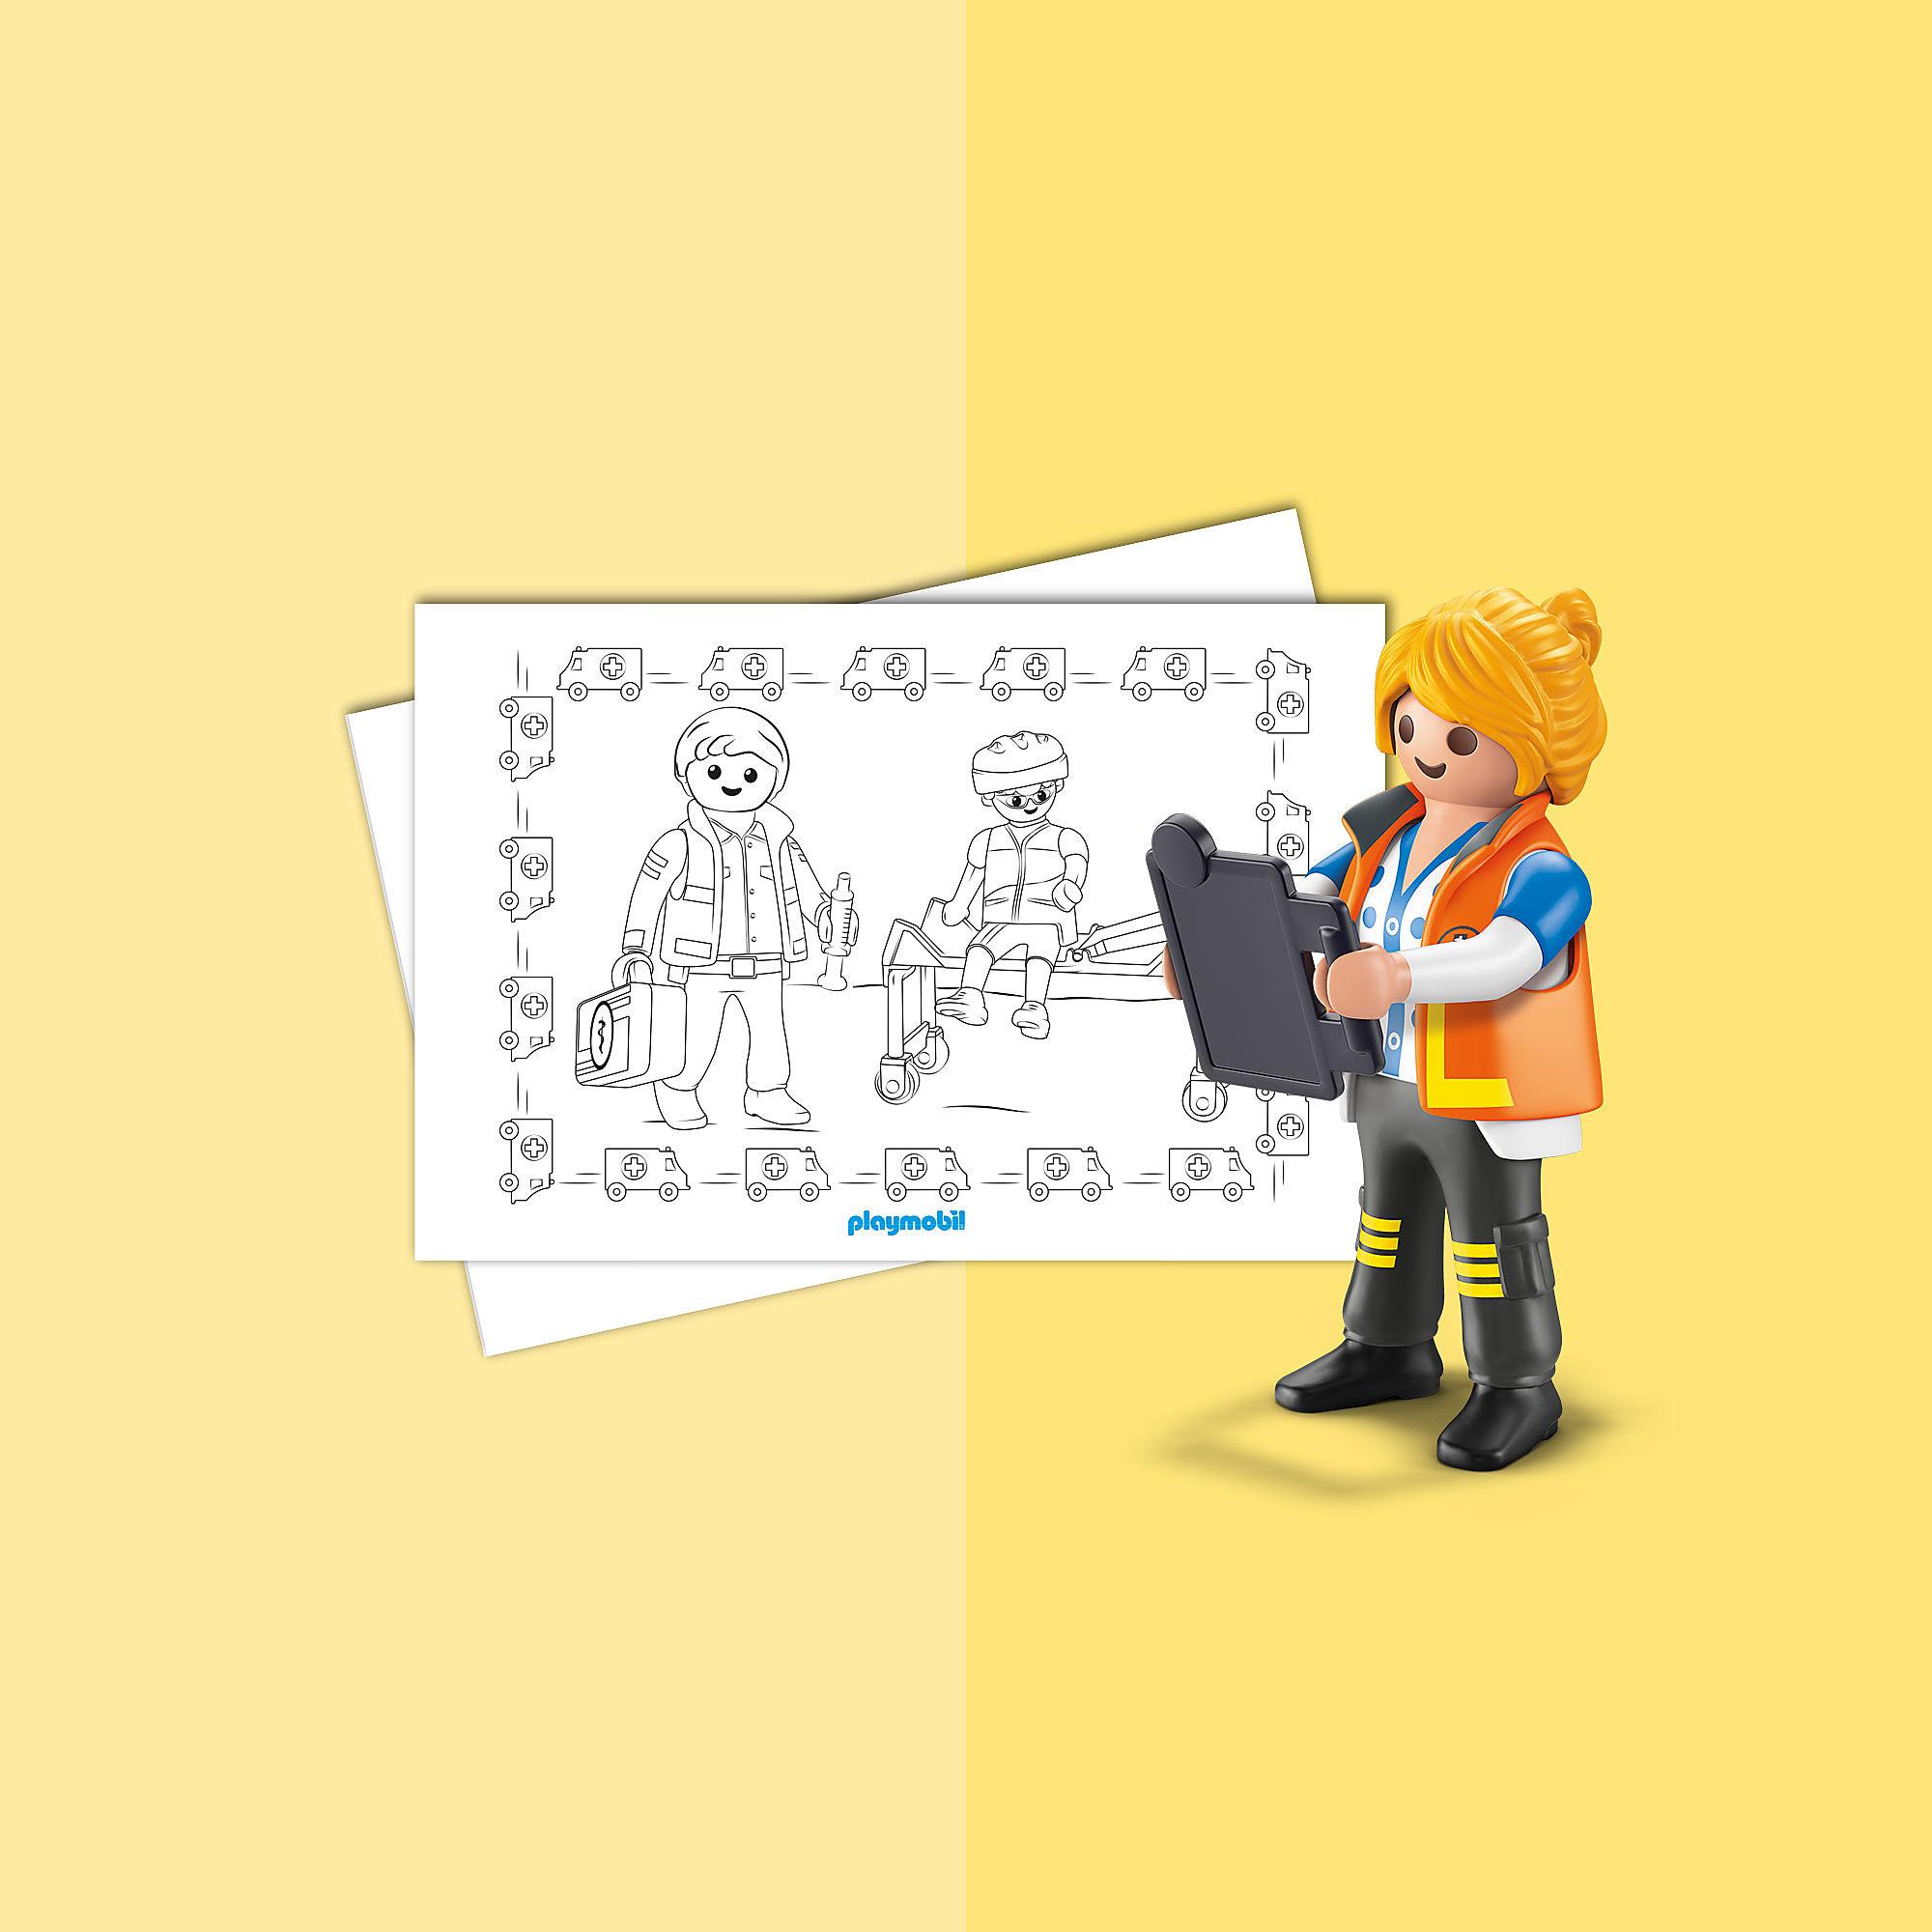 malblatt  playmobil rettung playmobil® deutschland